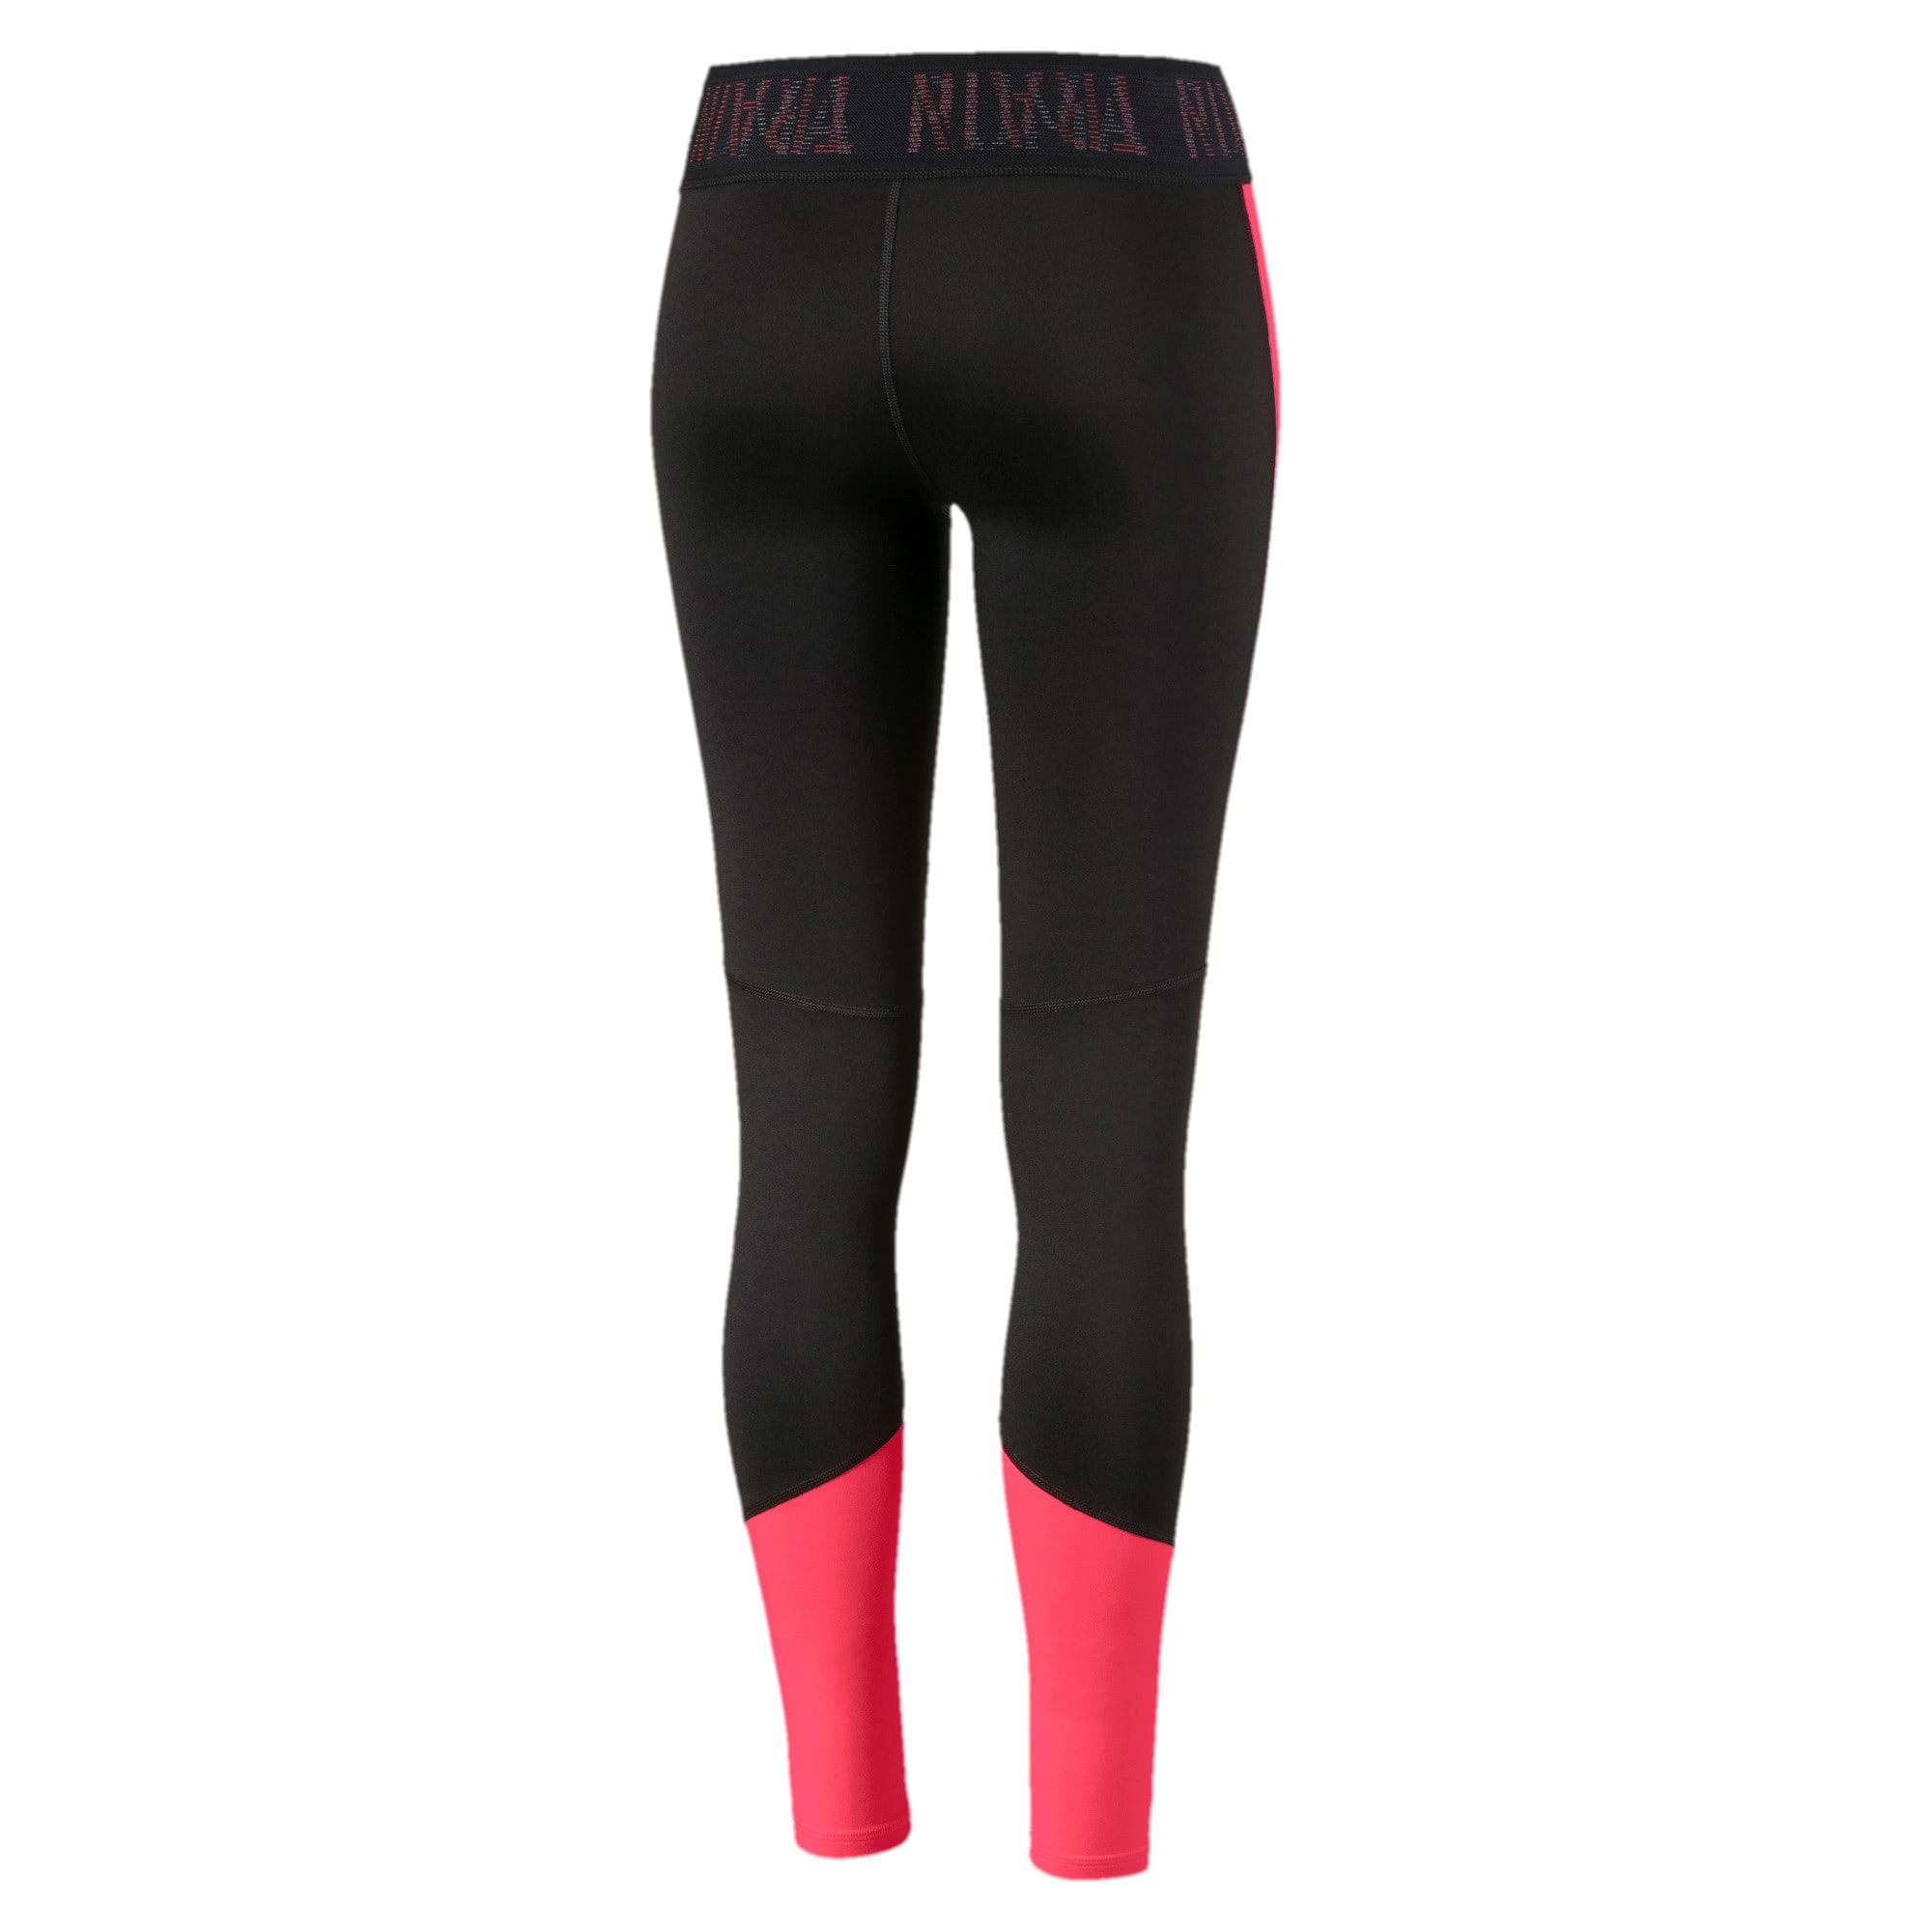 Thumbnail 5 of Logo Women's 7/8 Leggings, Puma Black-Pink Alert, medium